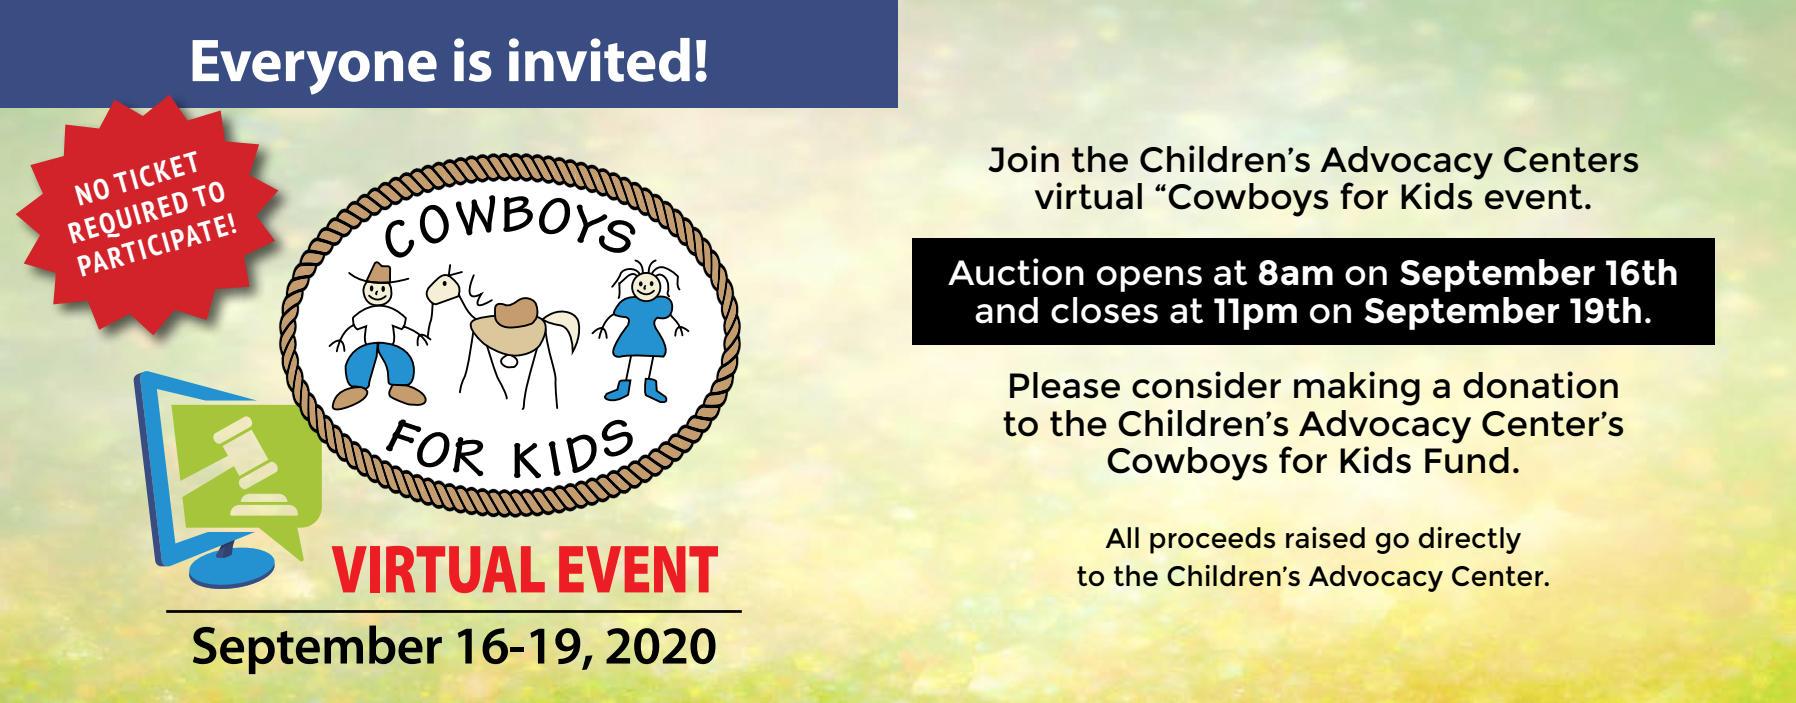 Johnson County Children's Advocacy Center